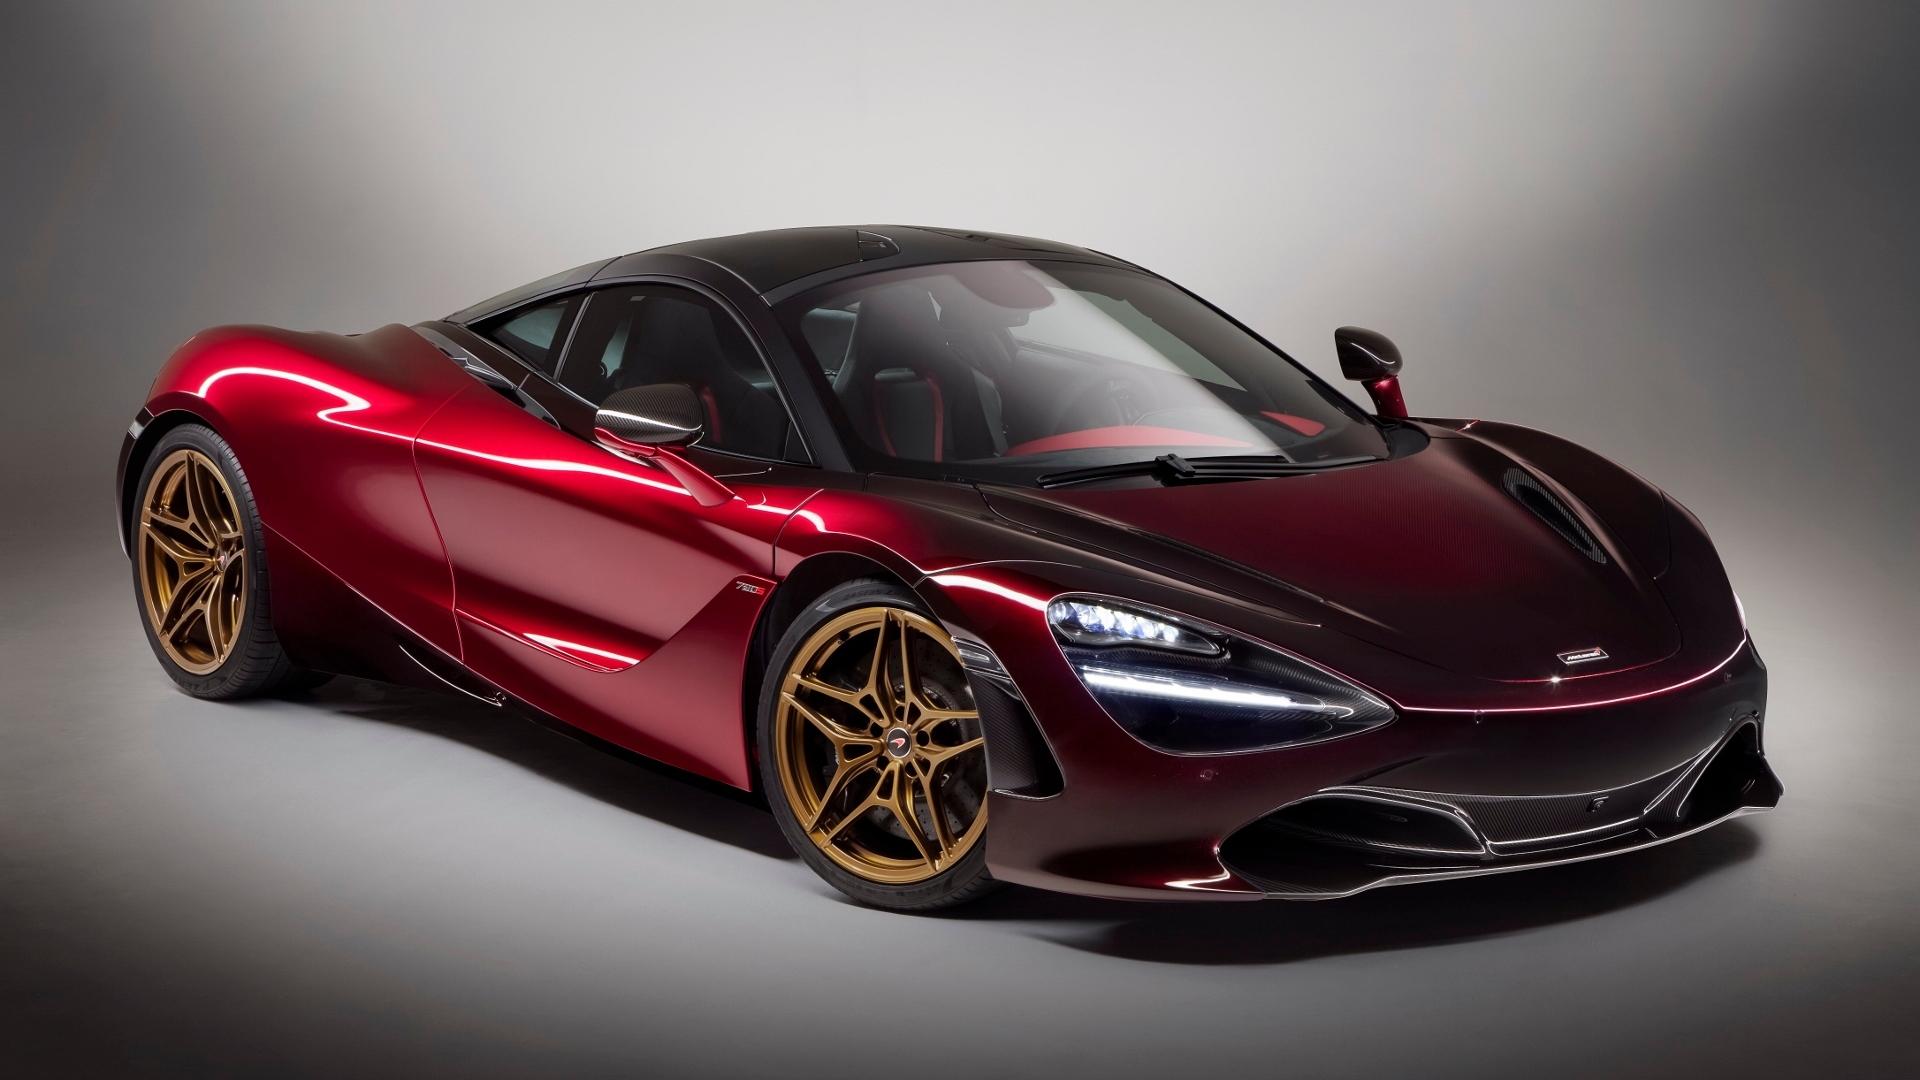 2018 McLaren 720S Velocity by MSO